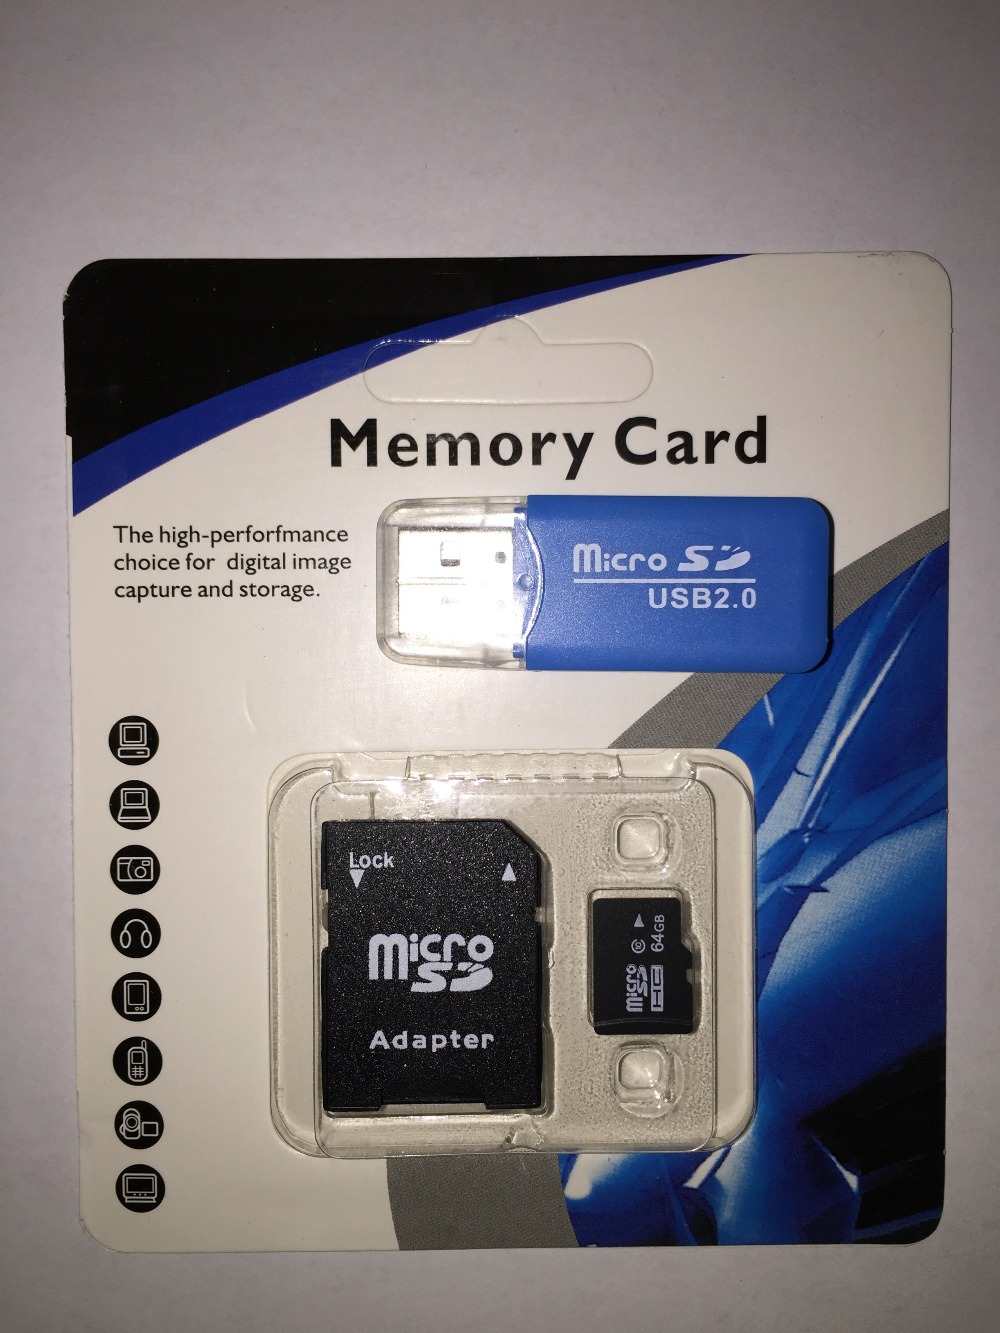 hot sell Free shipping micro sd card memory card 4gb 8gb 16GB 32 GB 64GB 128GB microsd TF Card for Cell phone mp3 micro sd class(China (Mainland))